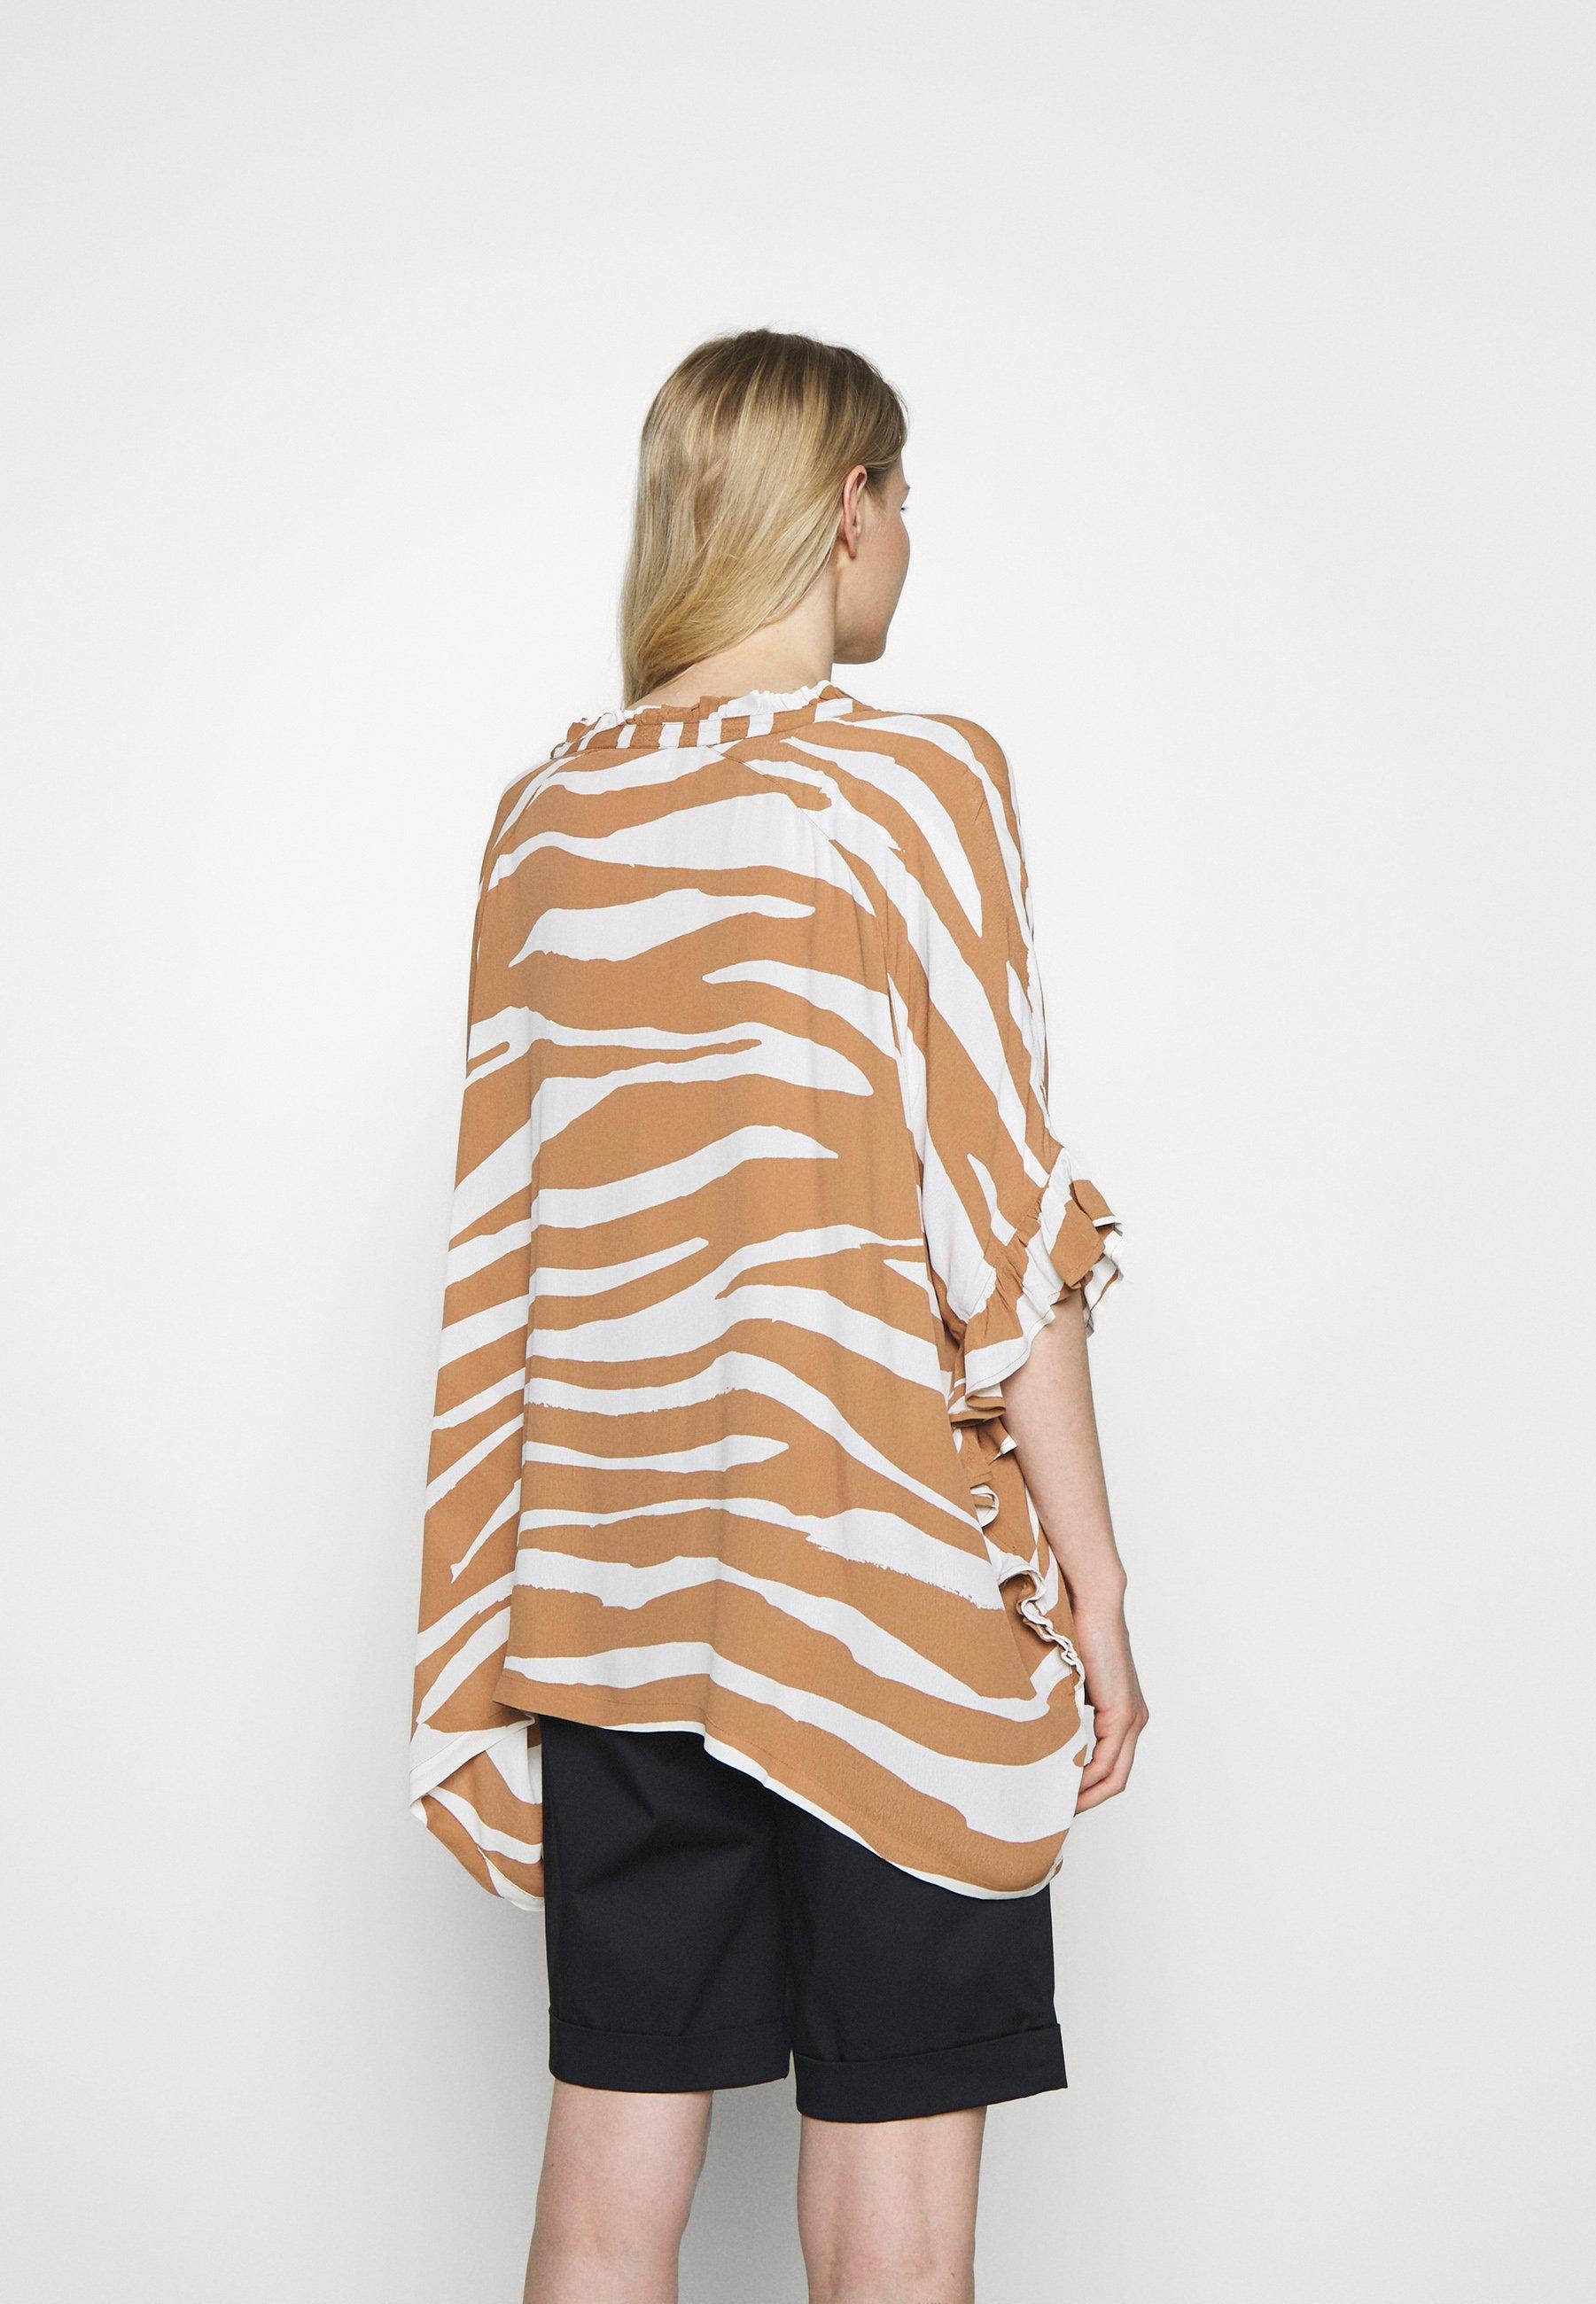 Get Online Women's Clothing Masai IOYA Button-down blouse chipmunk lRcRJvRPx